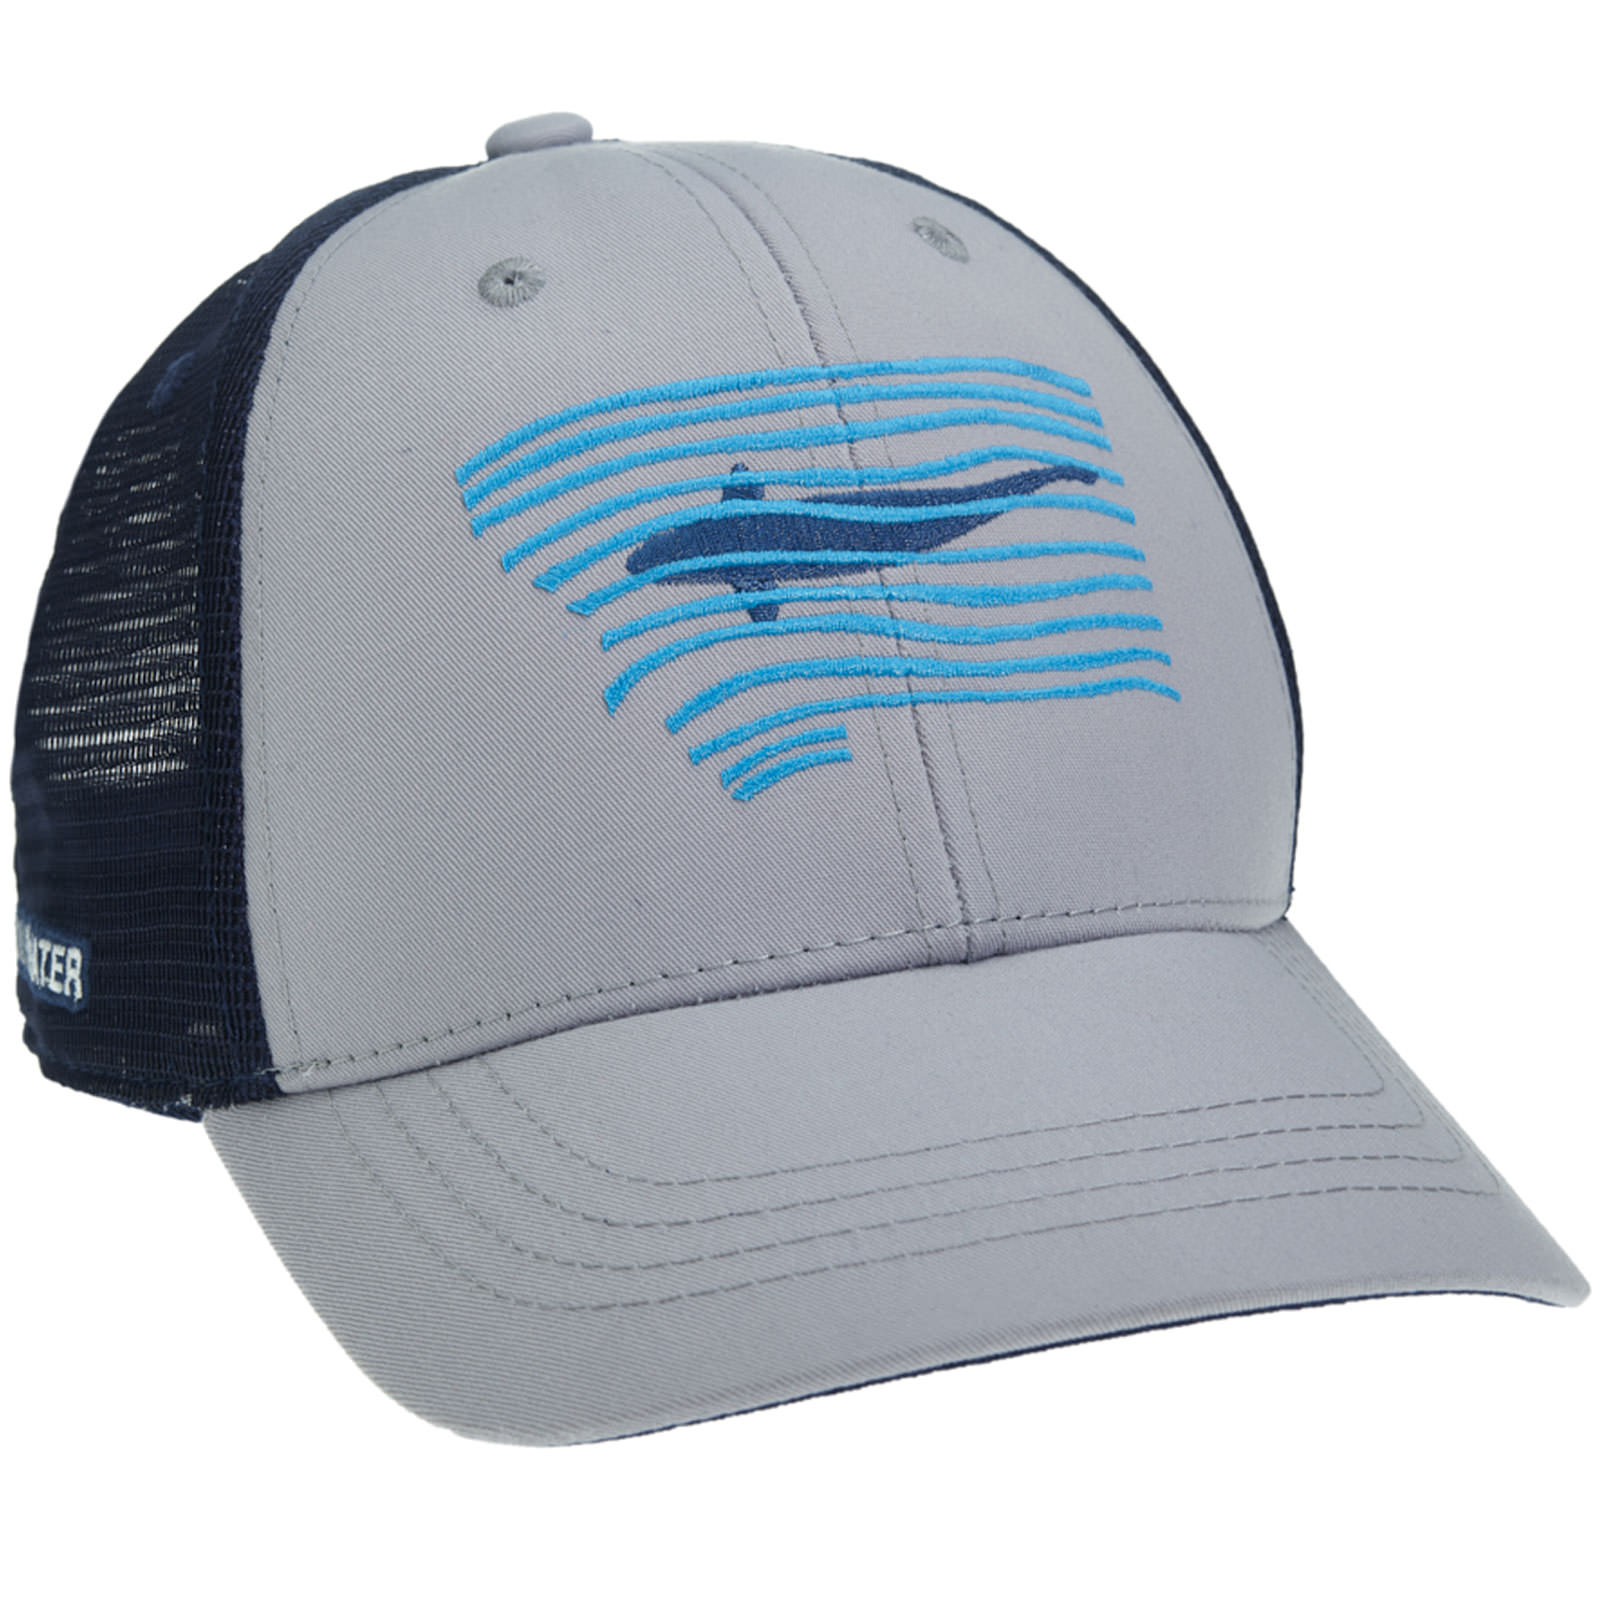 FYFYOK Baseball Mesh Hat Hats Bulldog and American Flag Curved Running Trucker Printed Caps Unisex